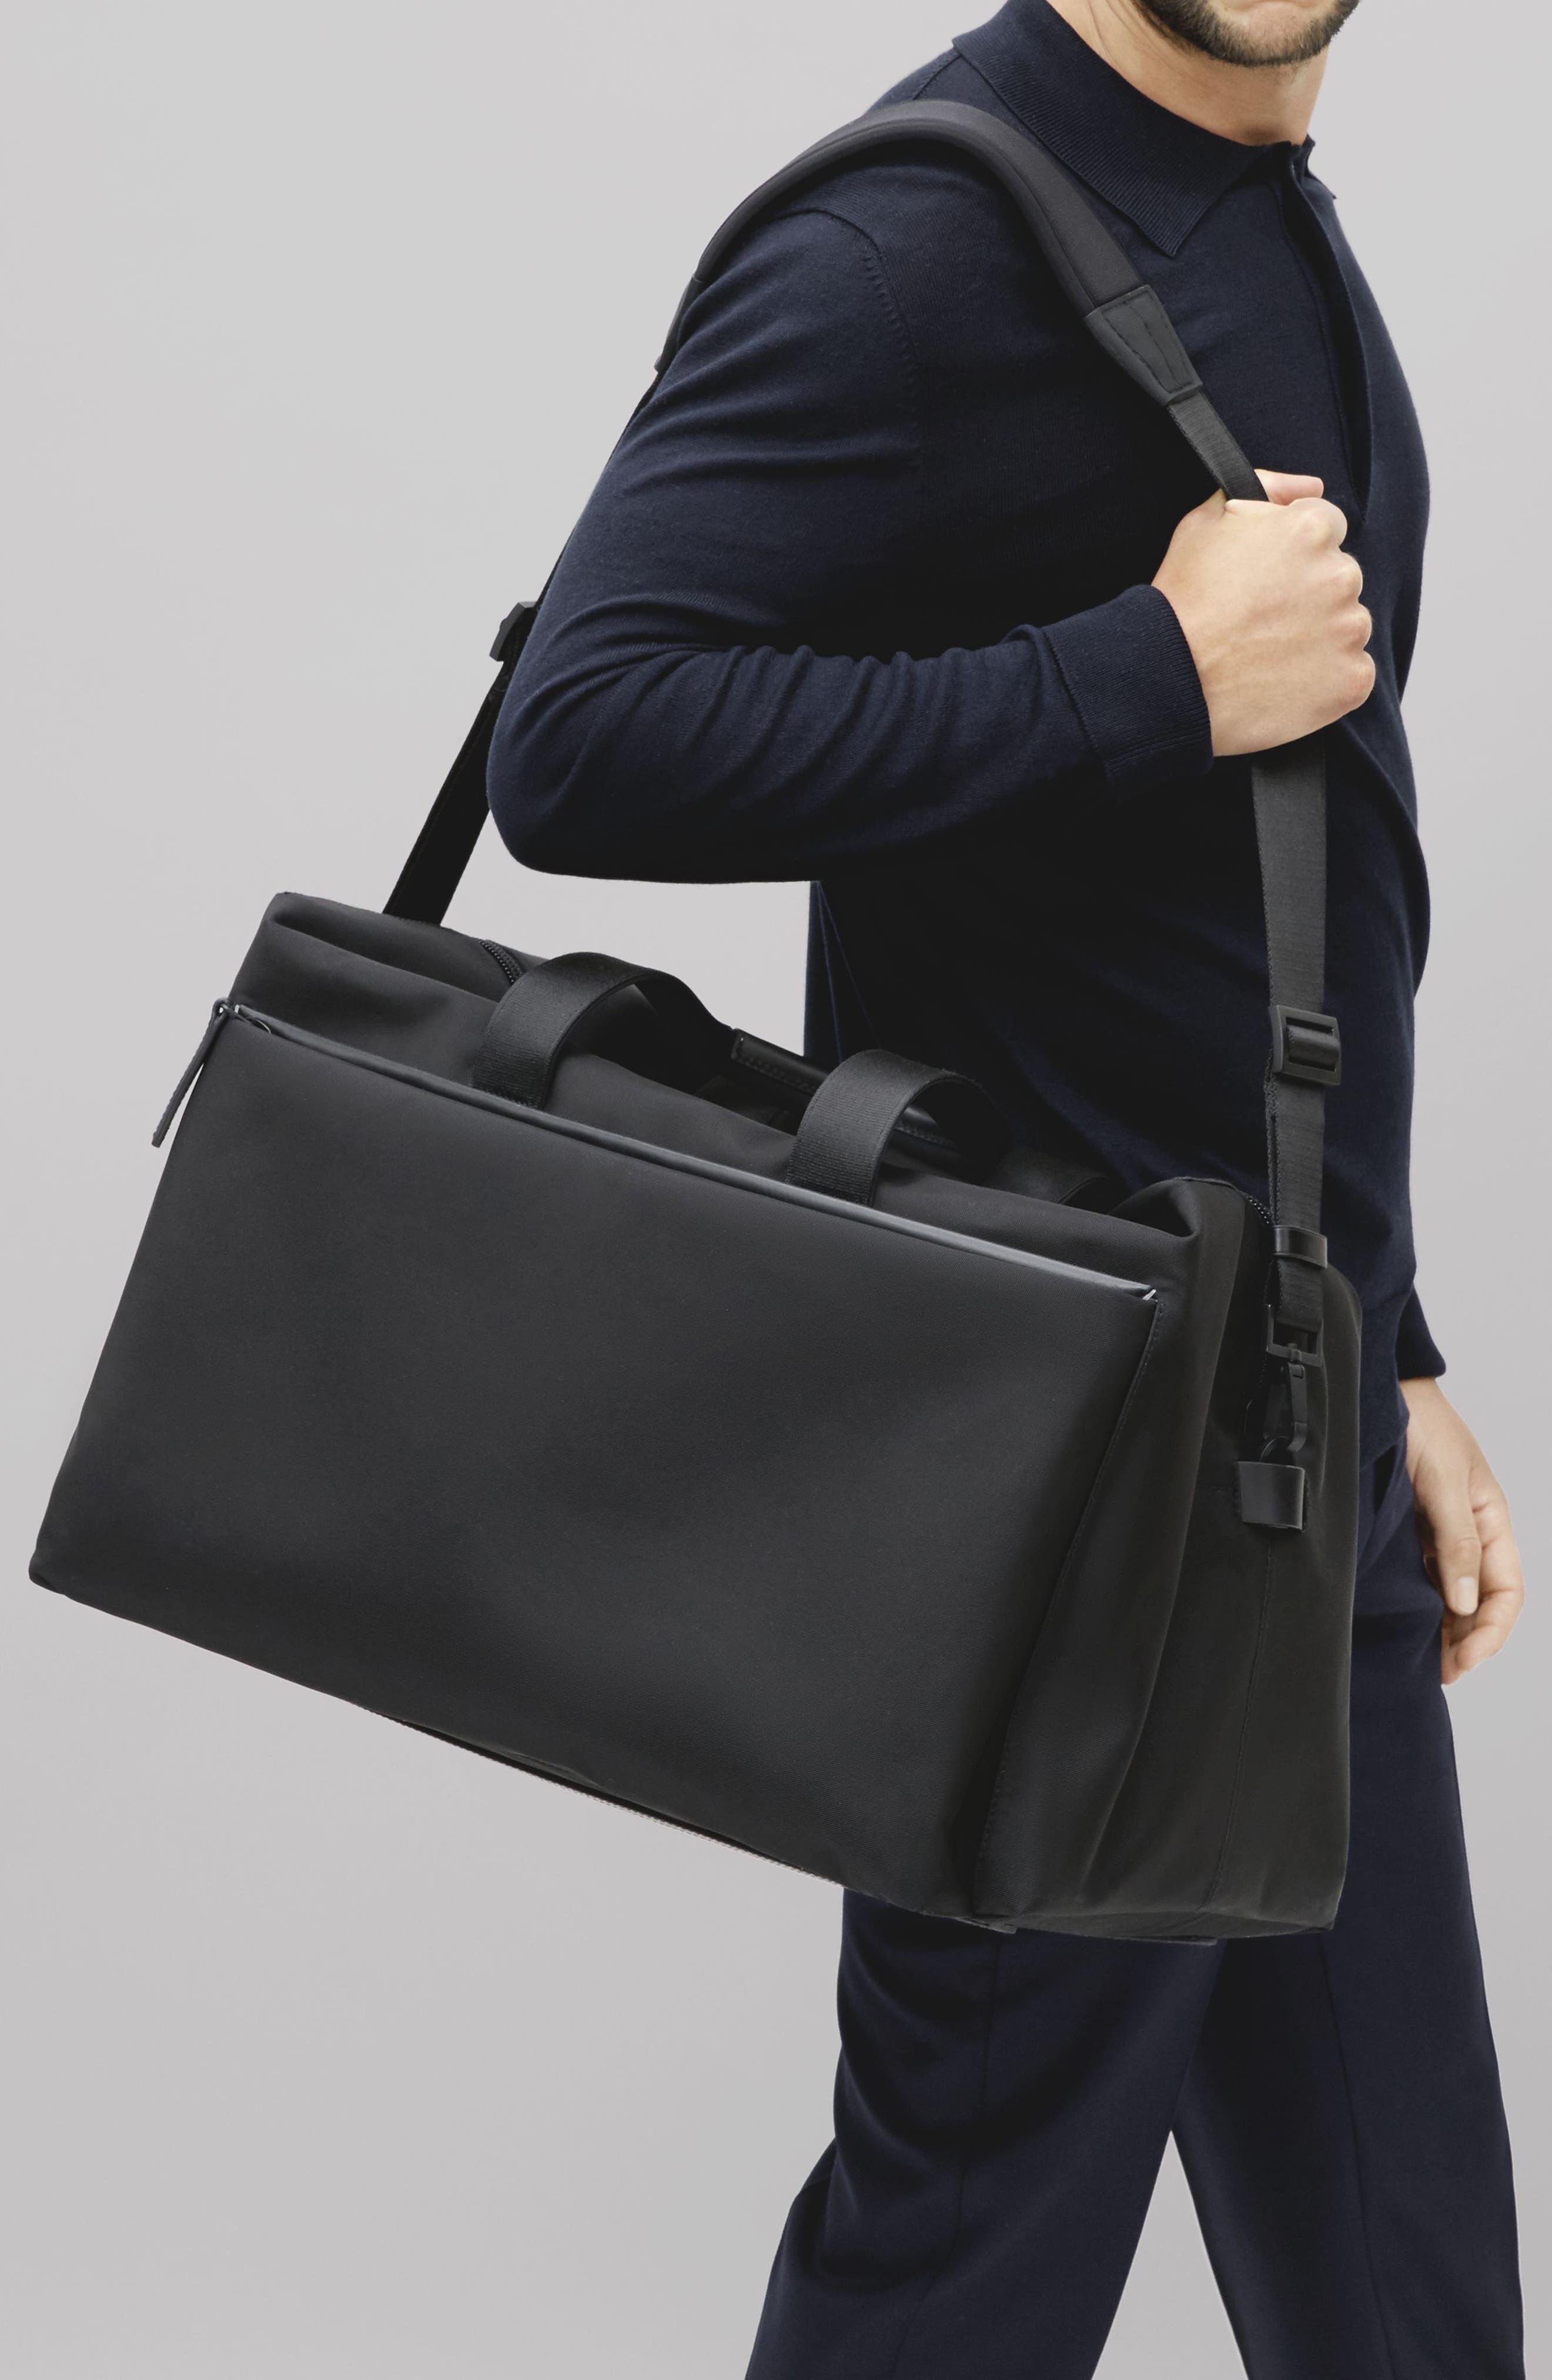 Lightweight Duffel Bag,                             Alternate thumbnail 10, color,                             Black Nylon/ Black Leather